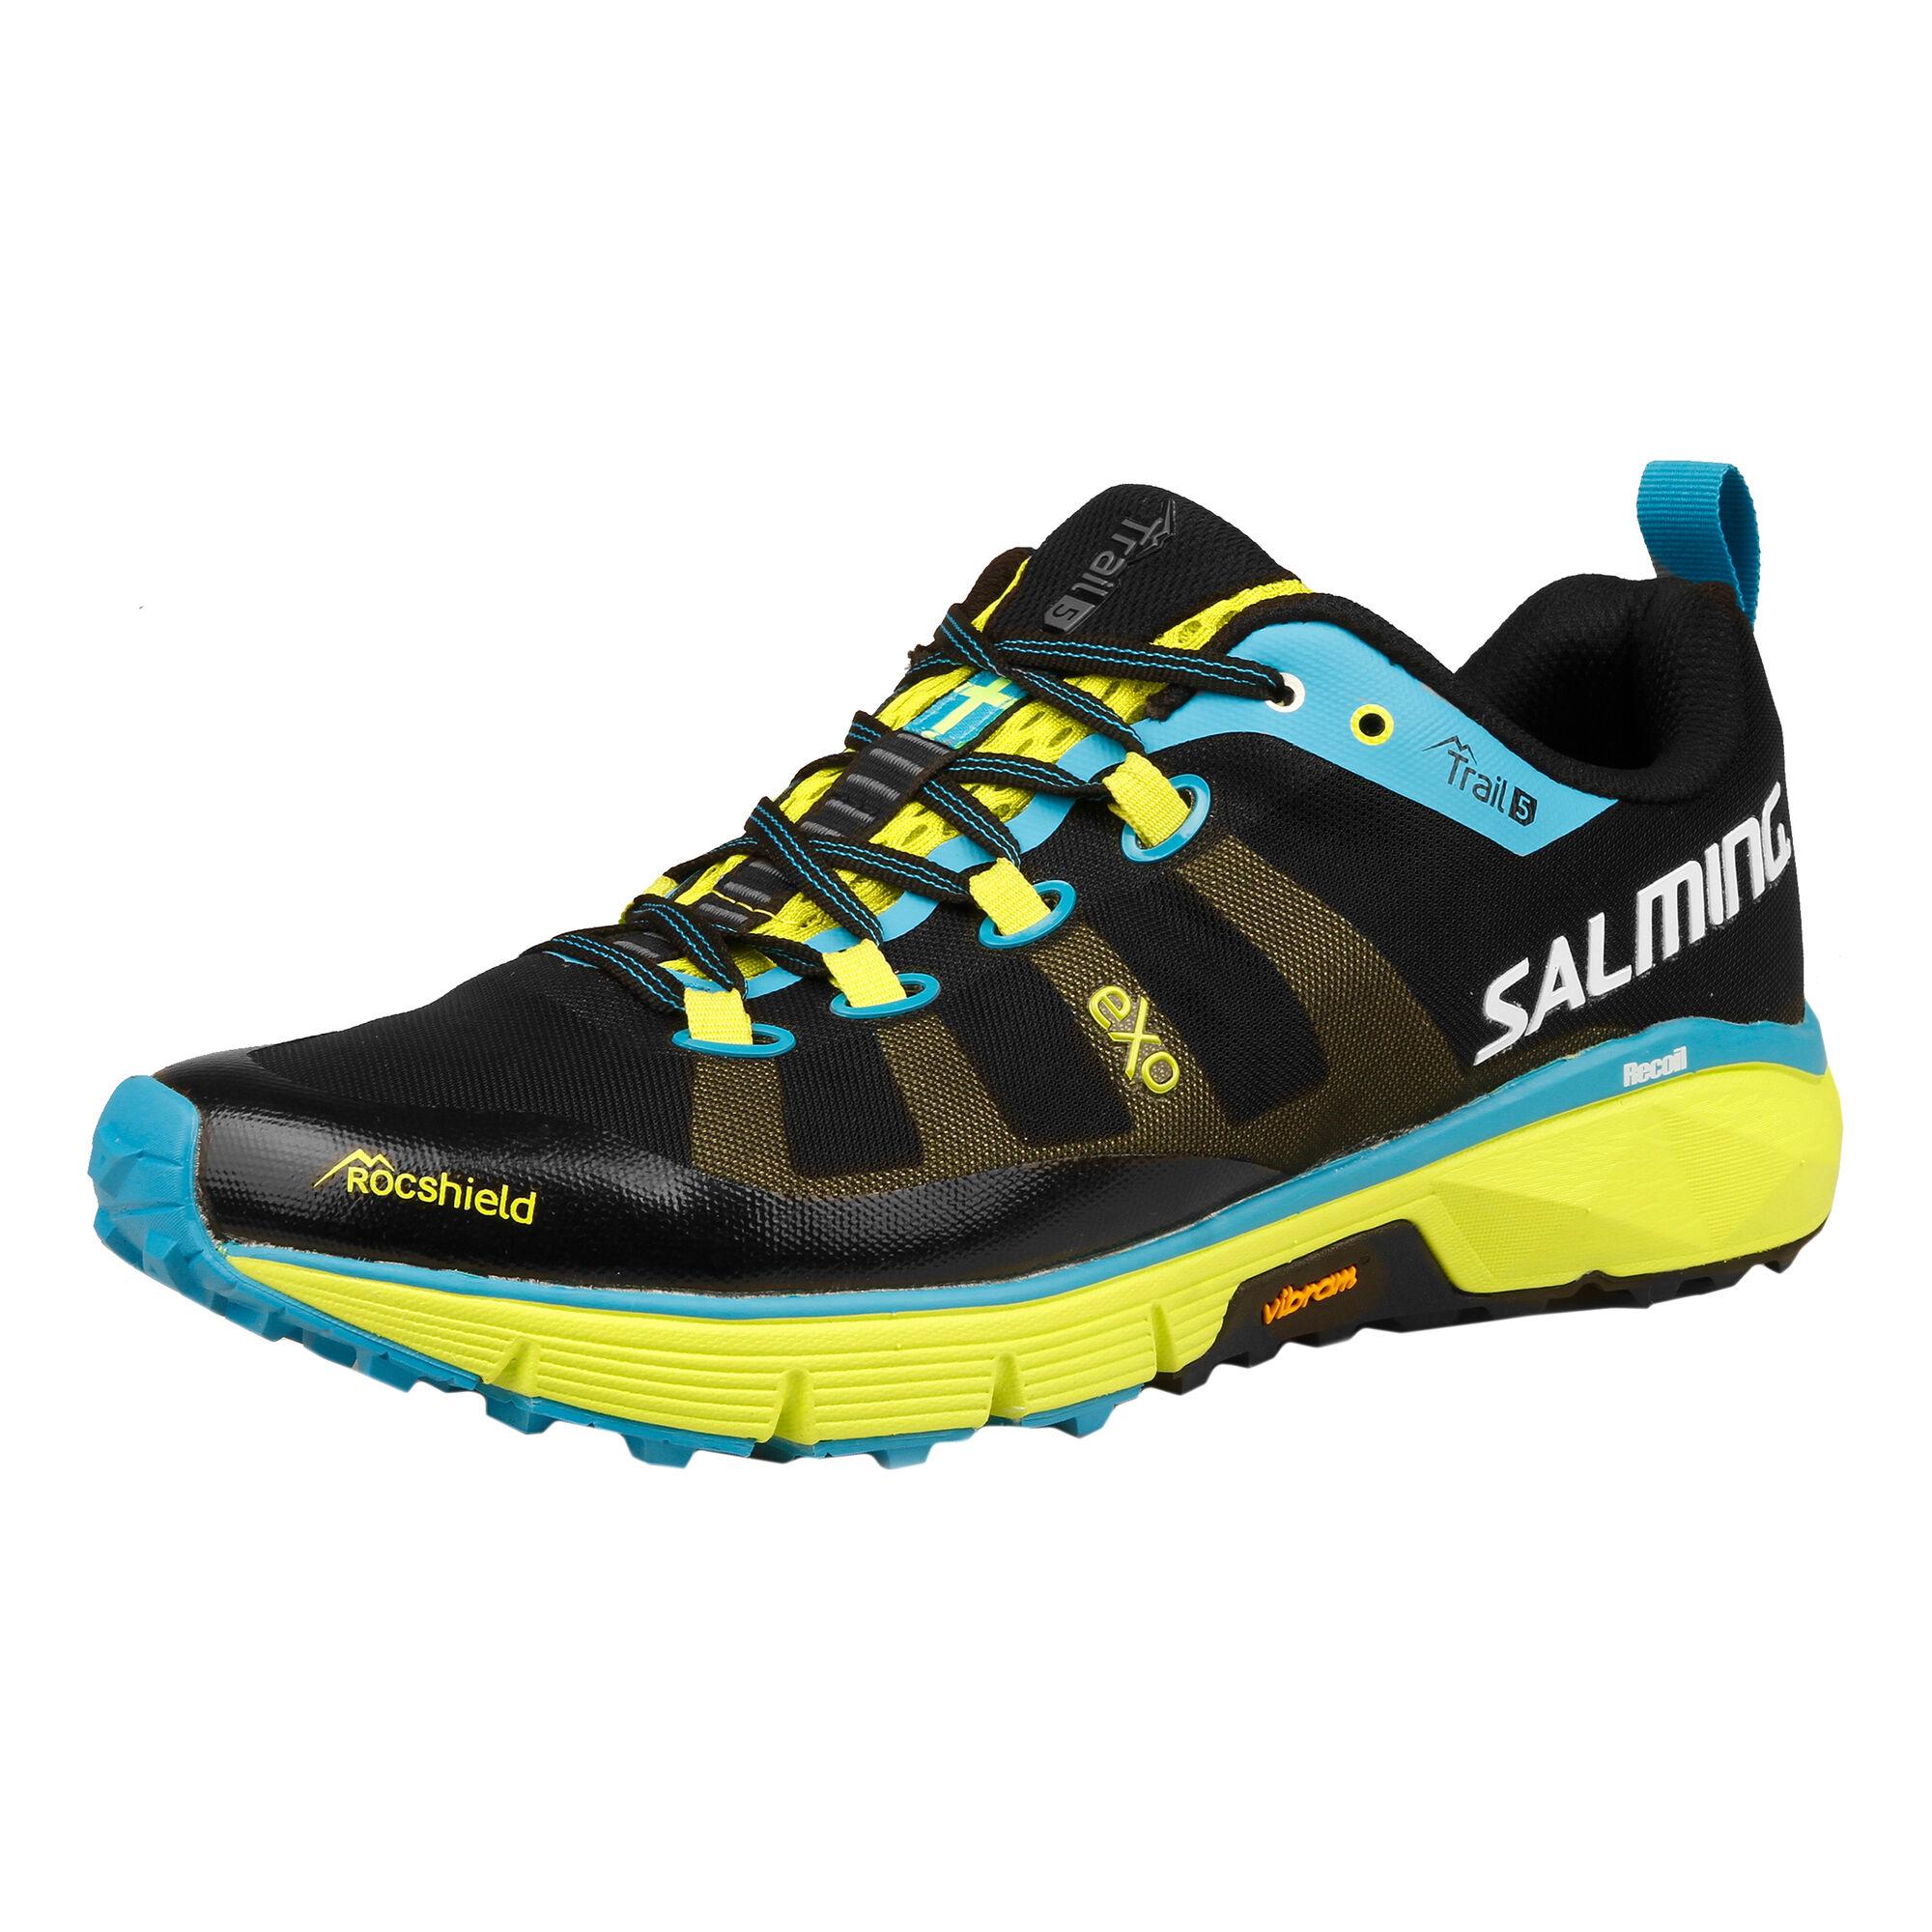 f7b0b6db406074 Salming  Salming  Salming  Salming  Salming  Salming  Salming  Salming. Trail  5 Men ...